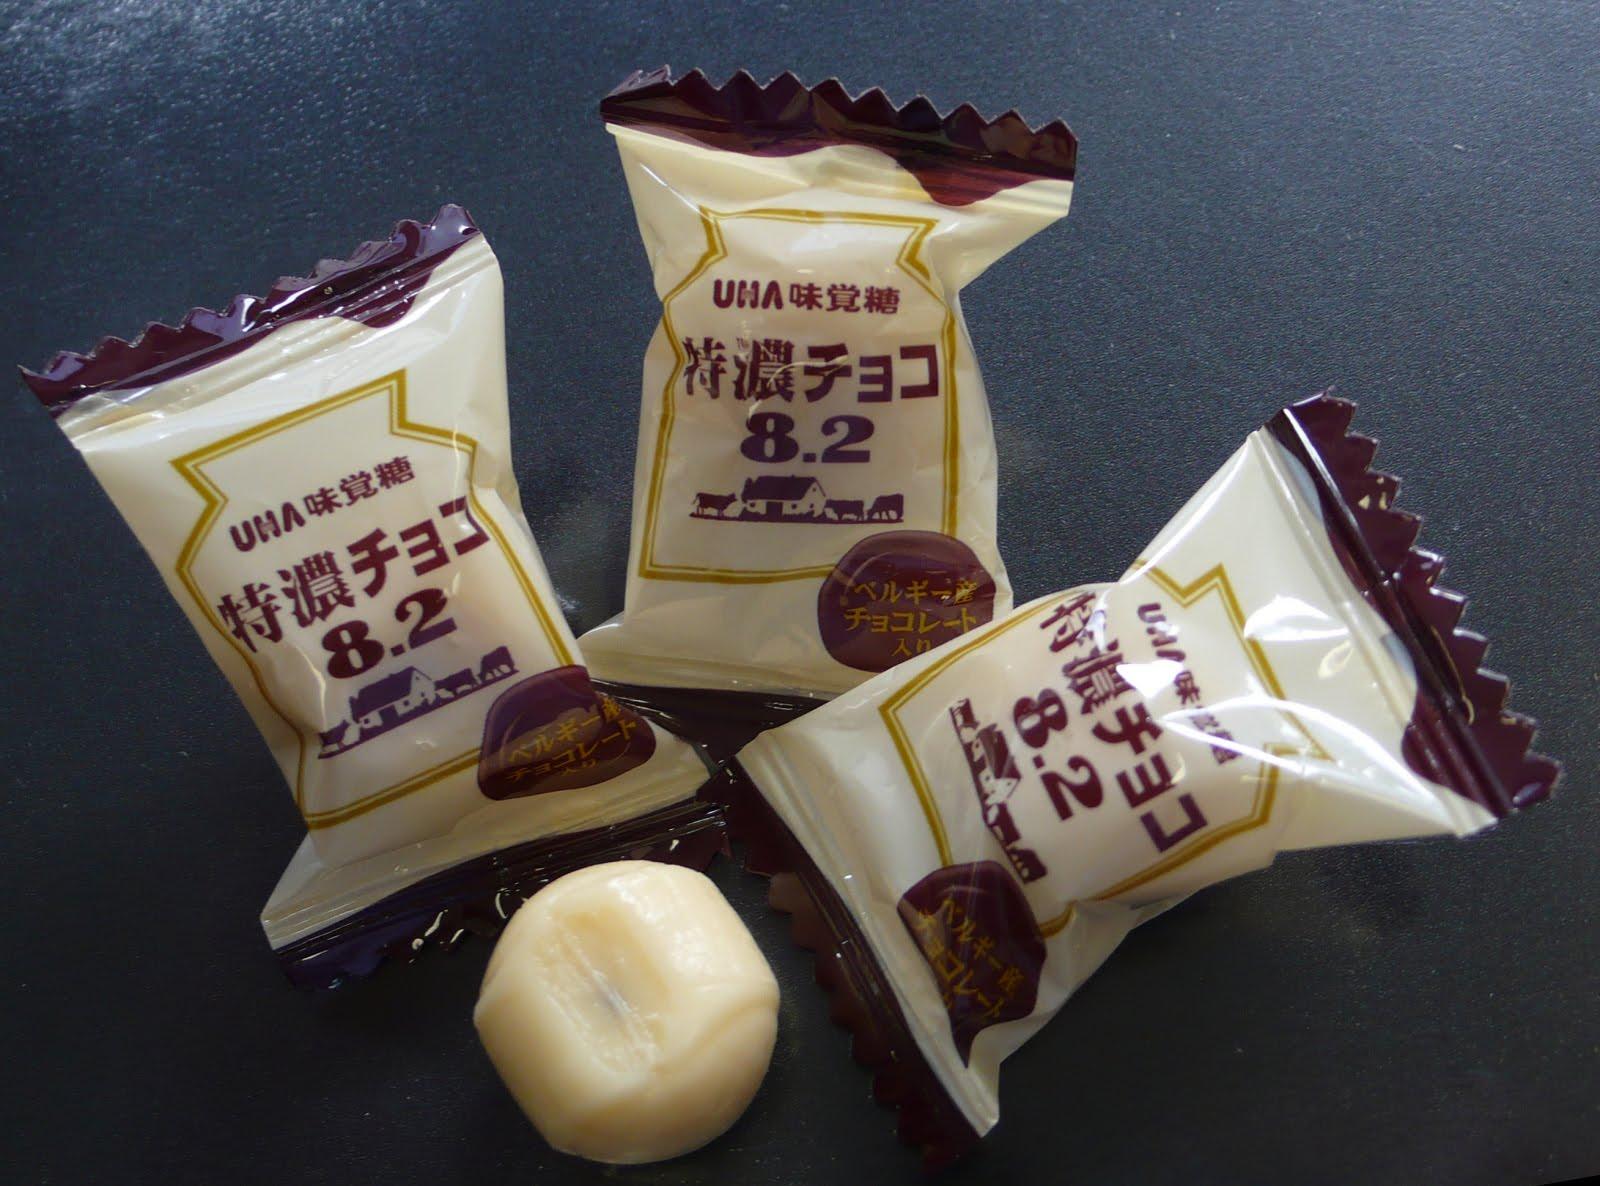 The Candy Bowl Uha Tokuno Dense 8 2 Choco Candy